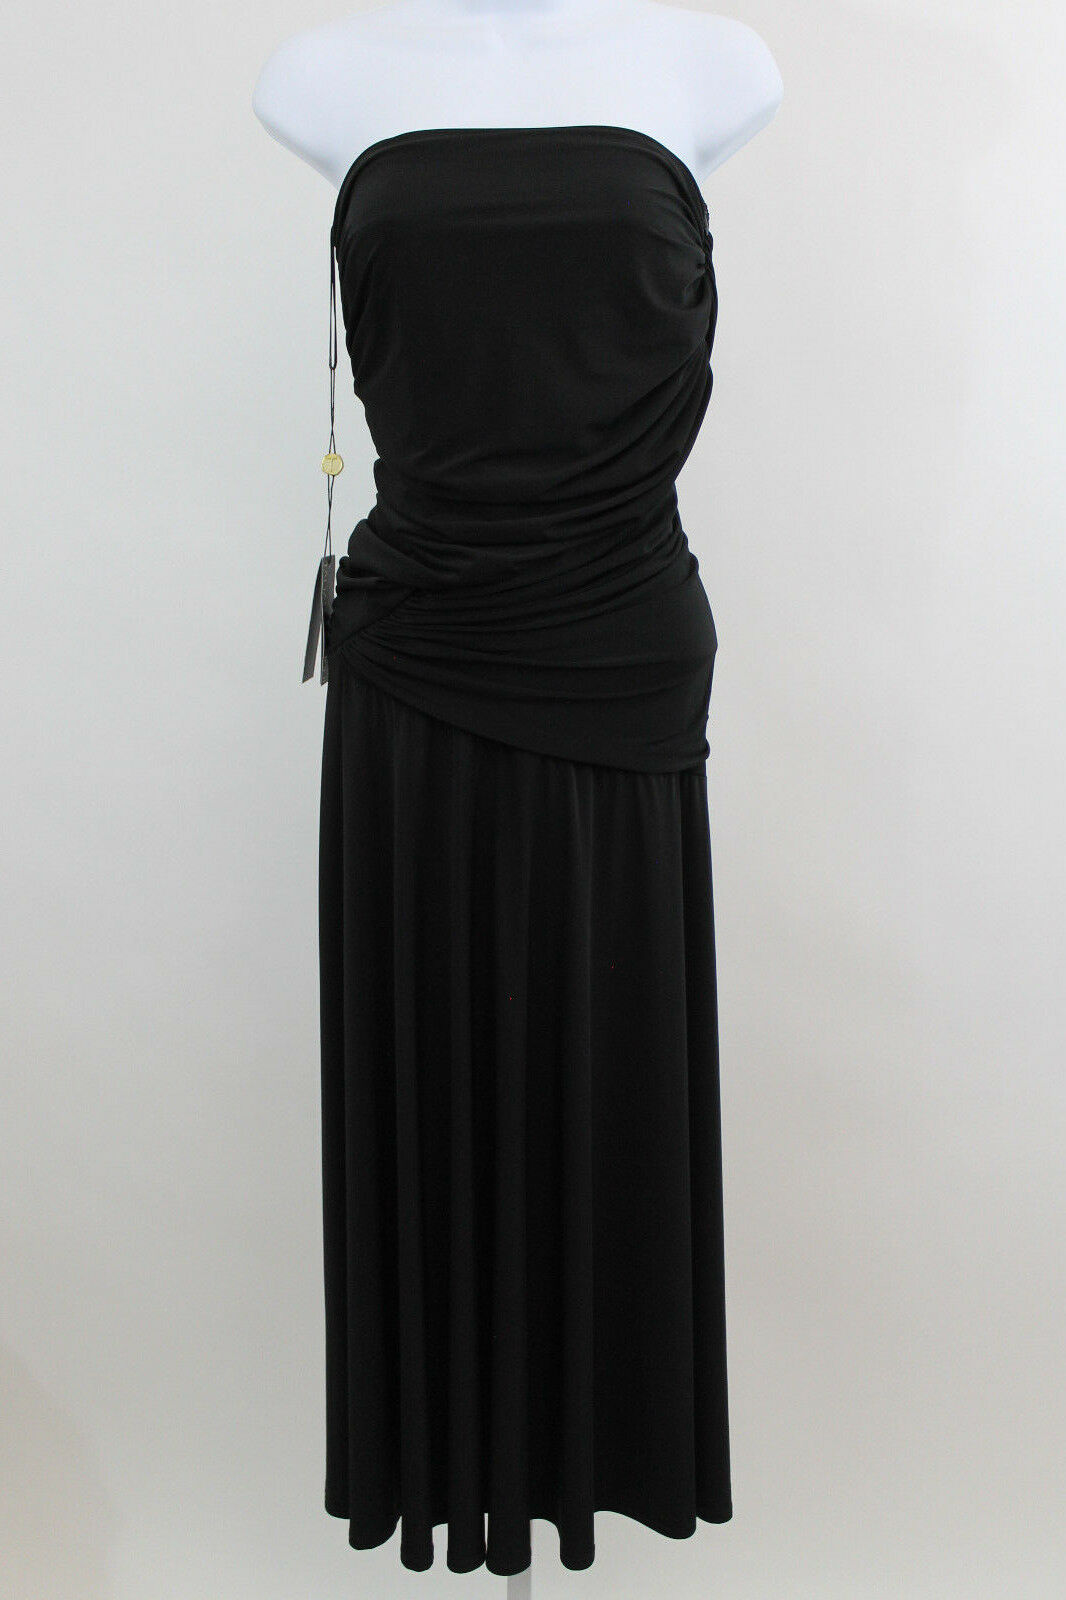 NEW Tadashi Shoji Draped Ruched Strapless Little schwarz Dress  SZ S NWT